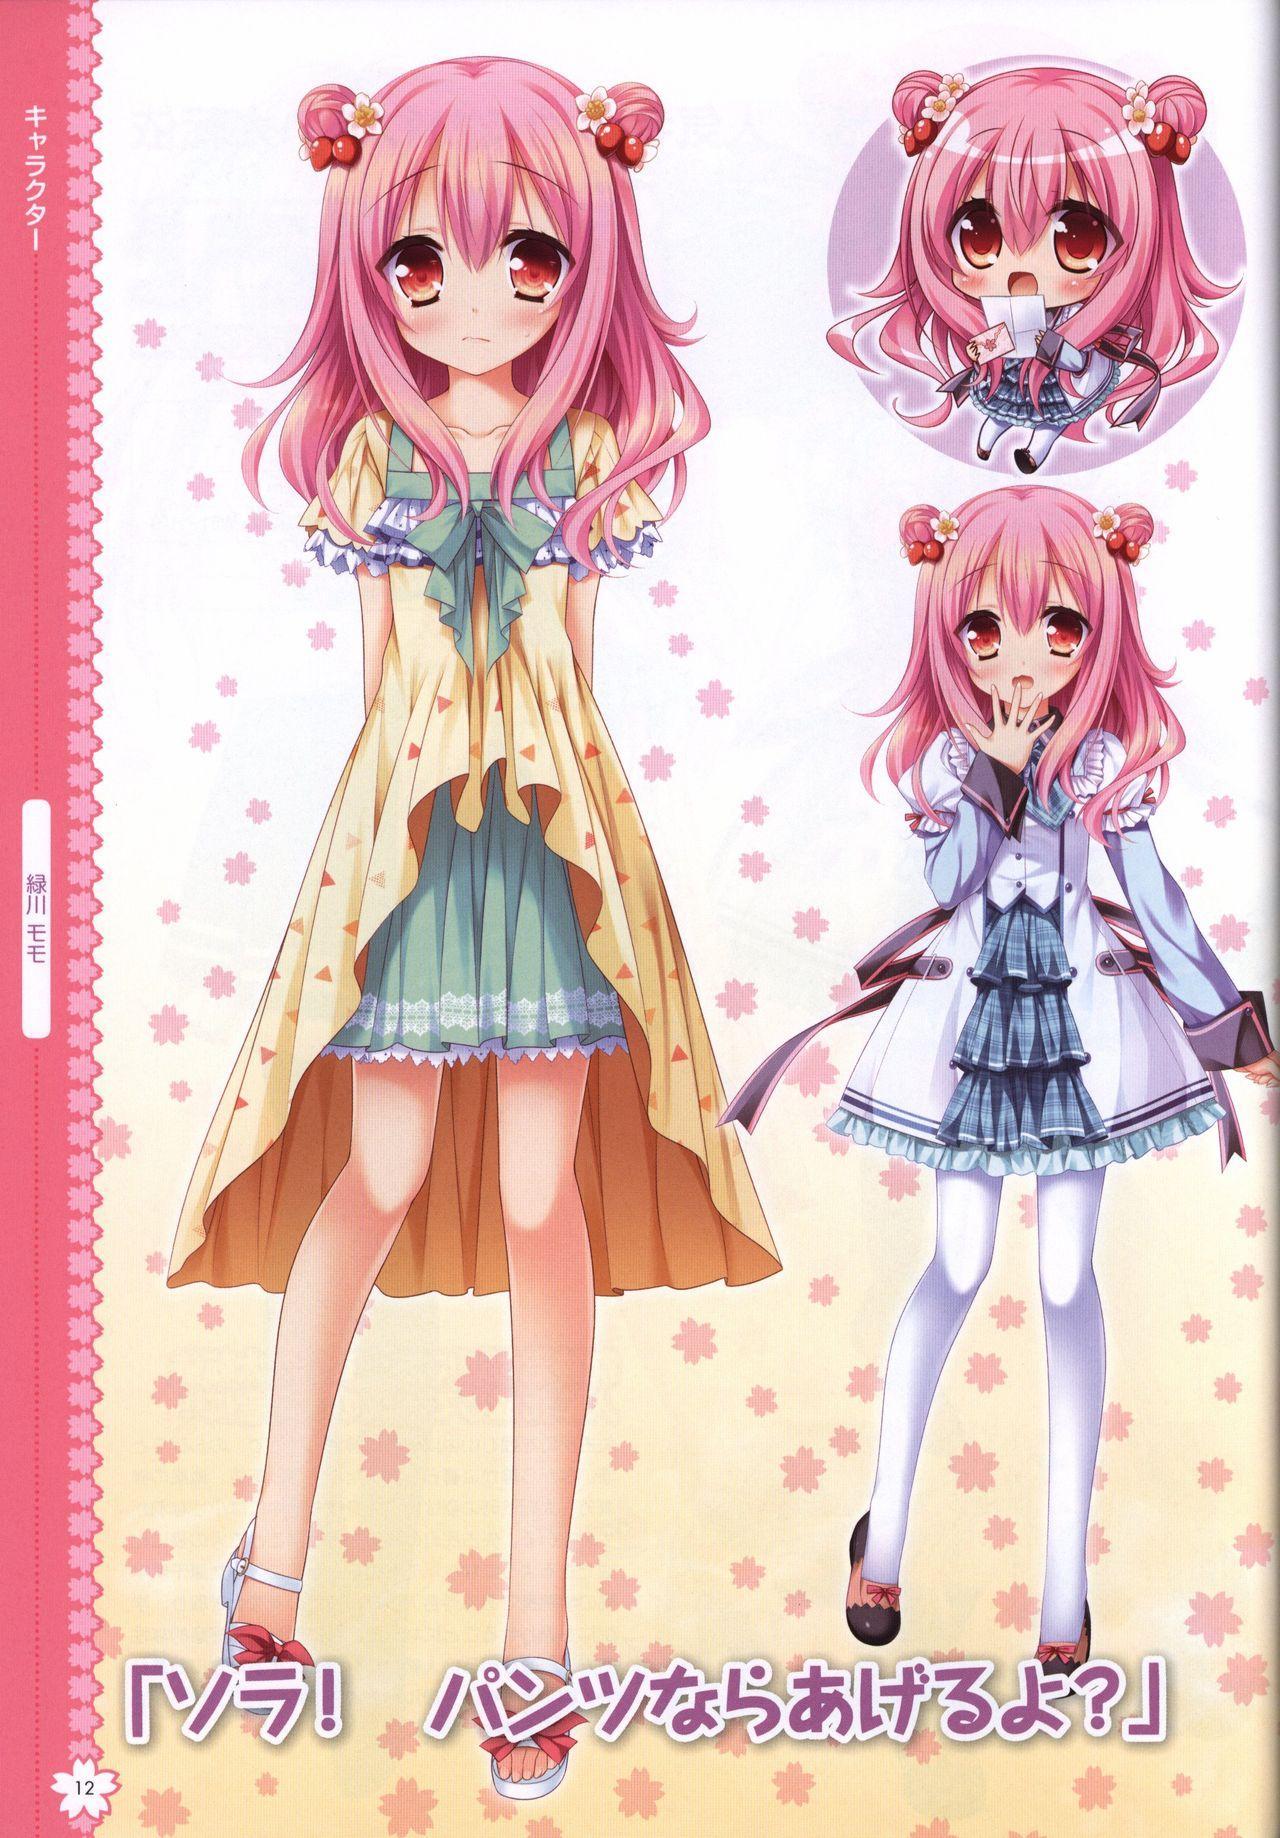 Tayutama2 Visual Art Fanbook 14